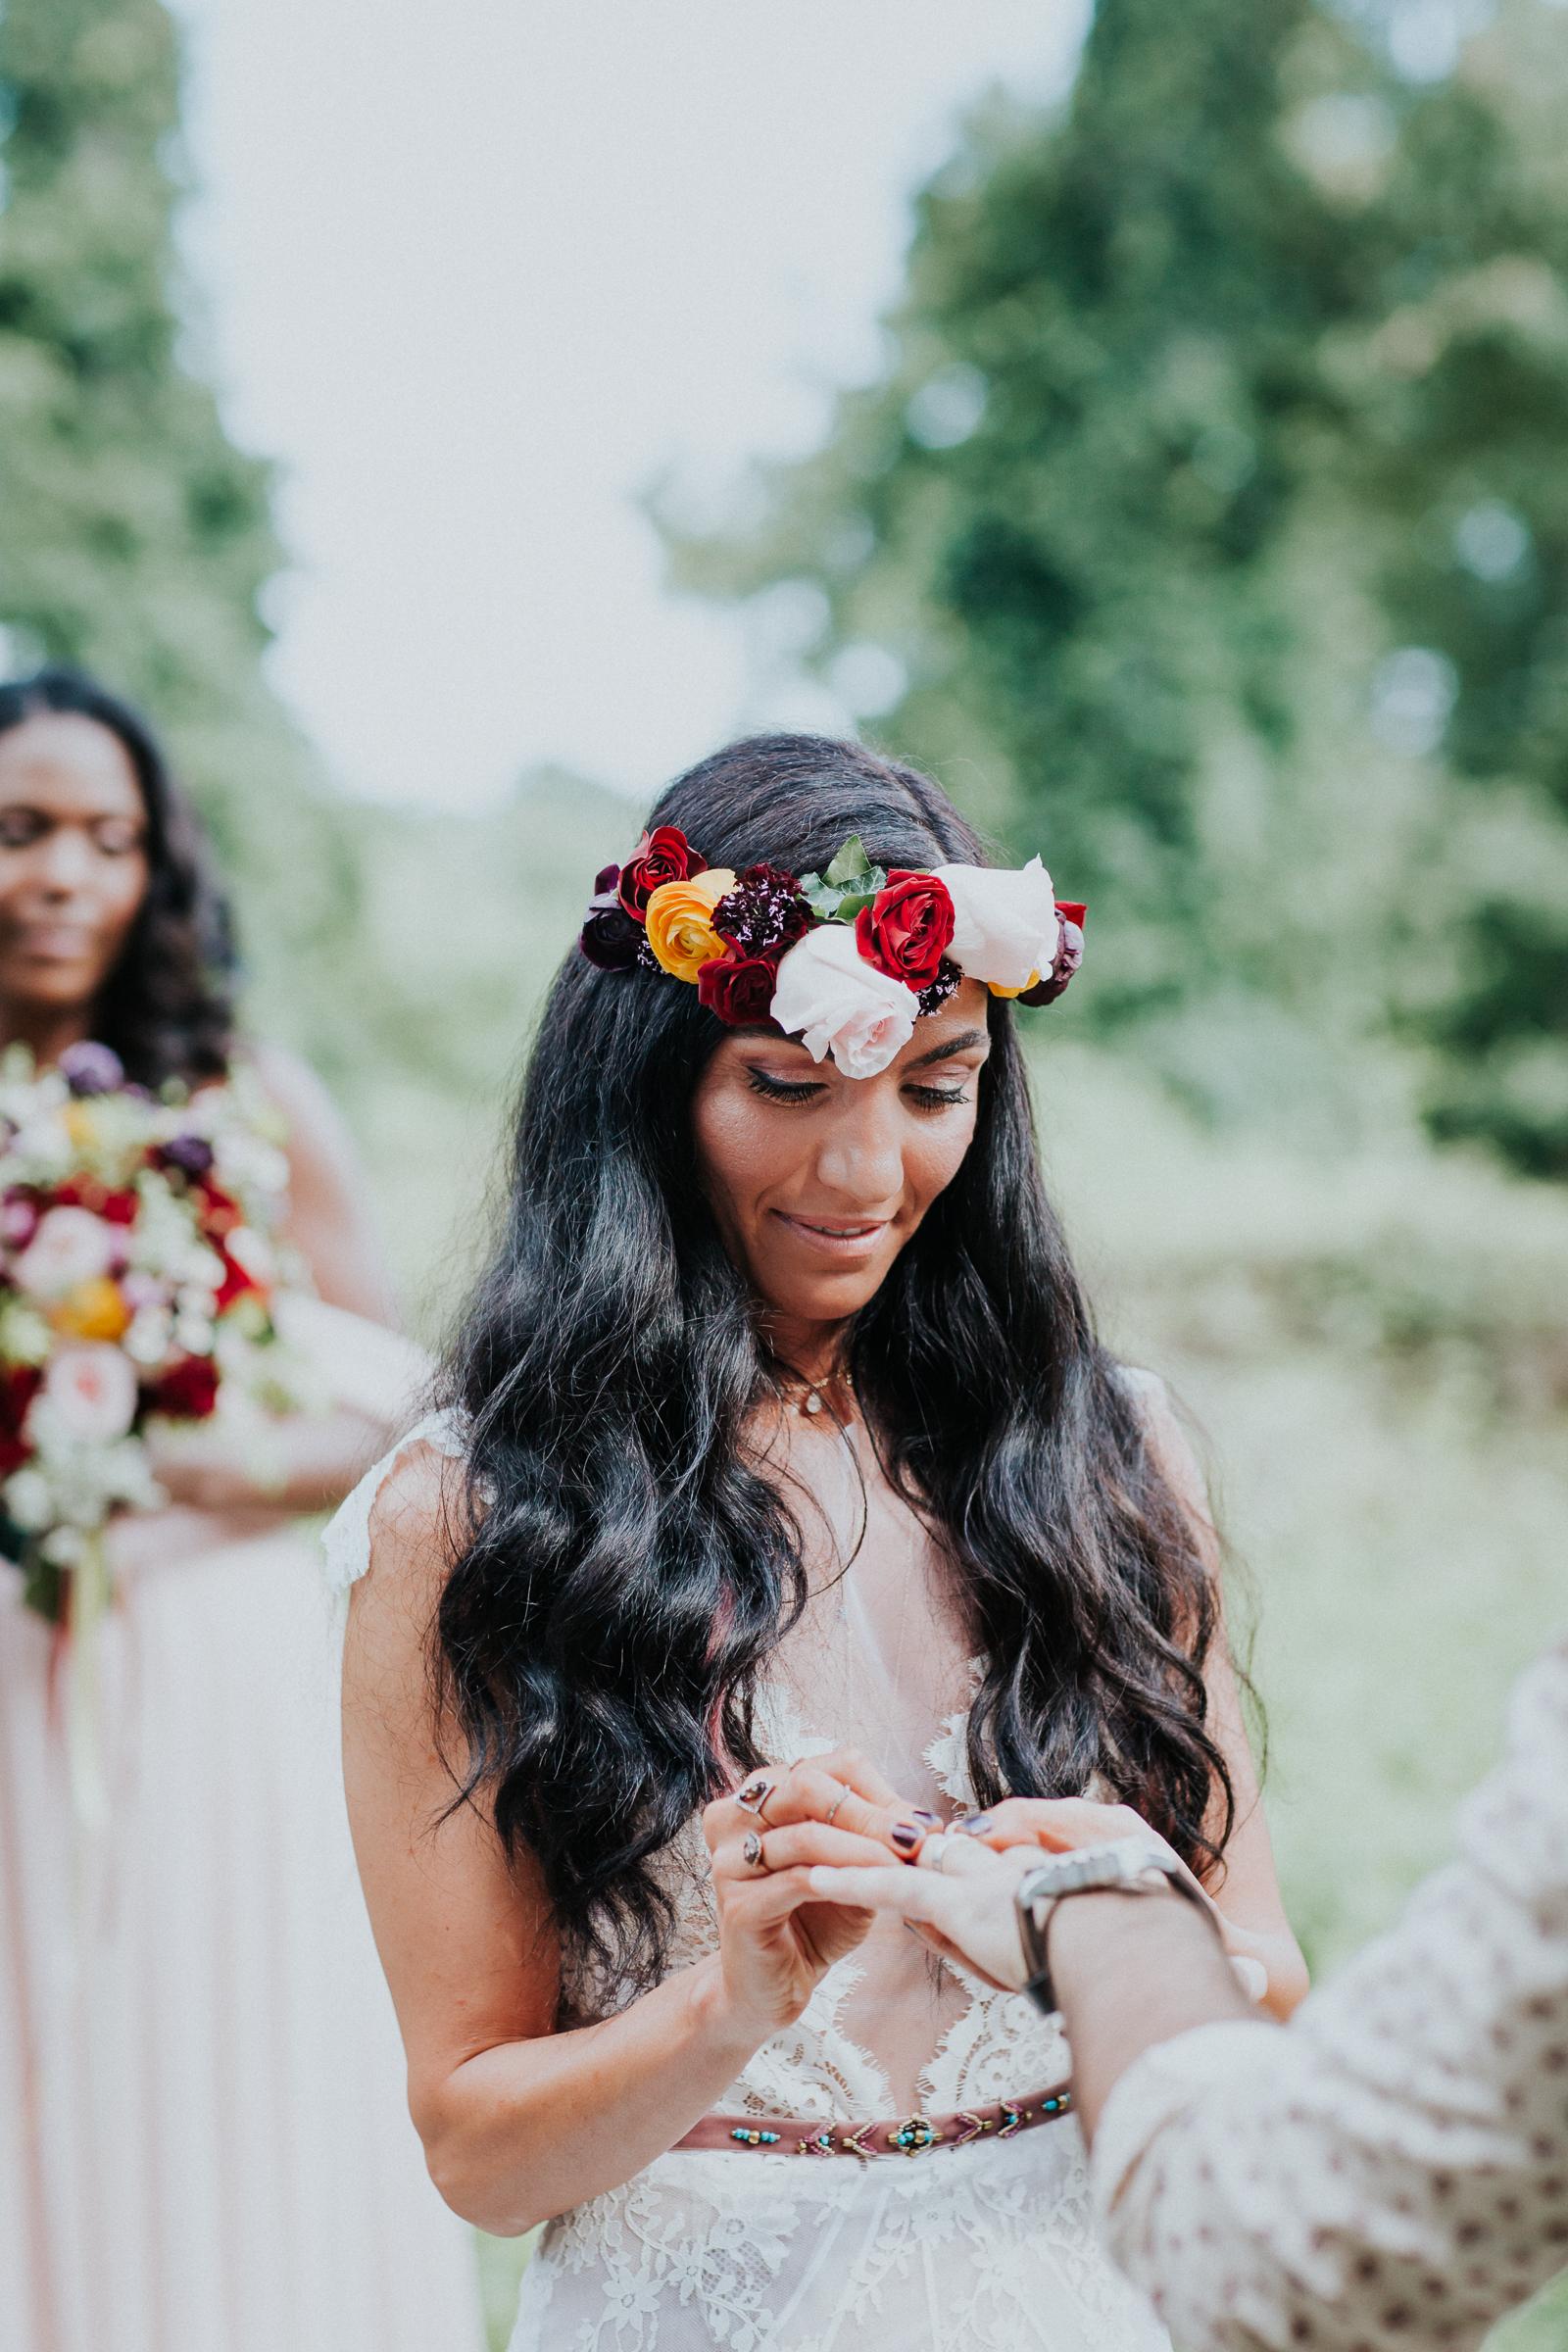 Backyard-Intimate-Adventurous-Destination-Wedding-Darien-Connecticut-Documentary-Wedding-Photography-58.jpg